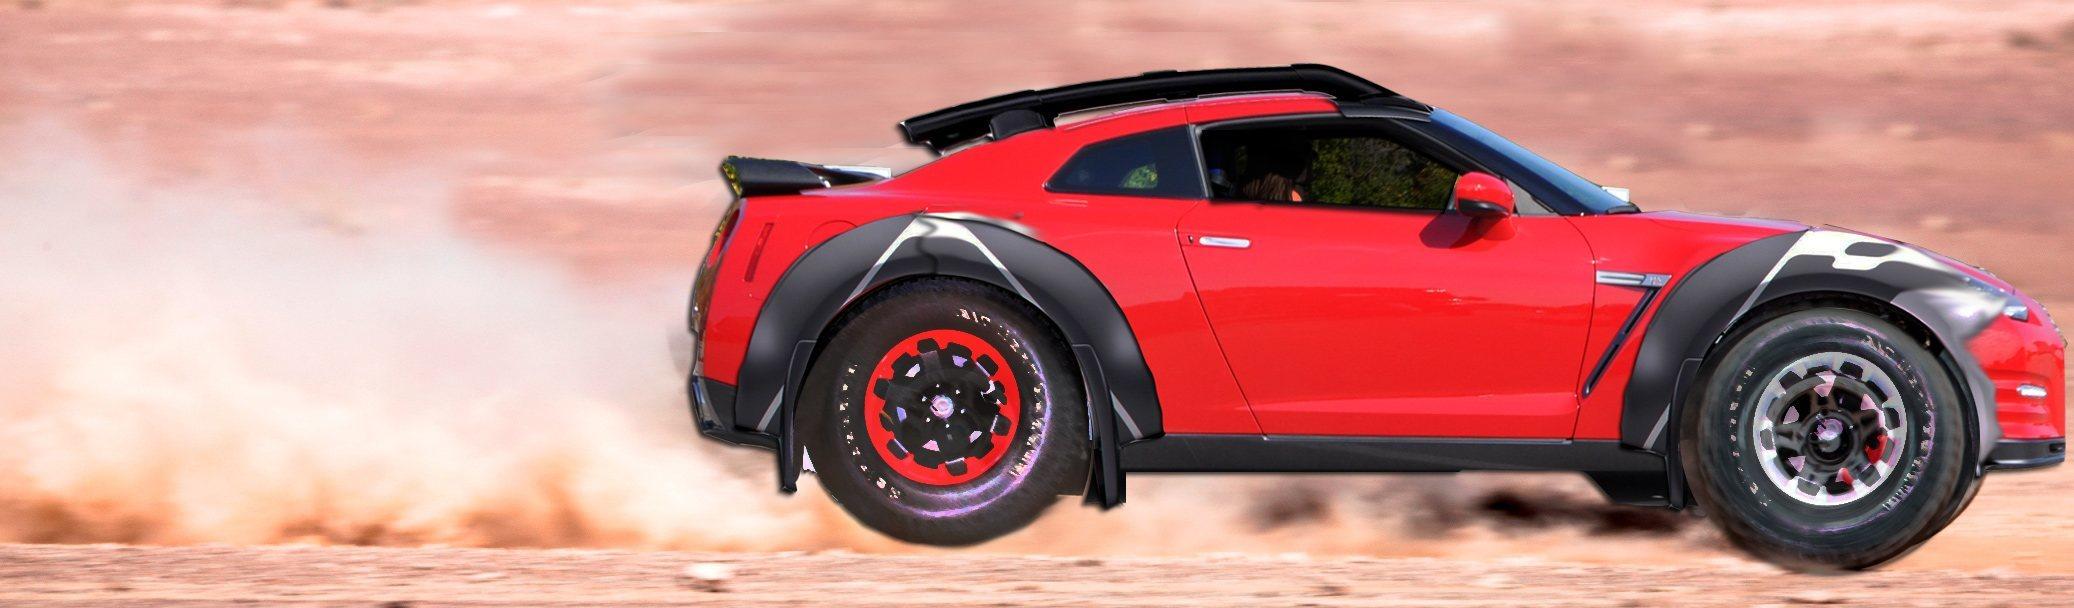 Nissan Gt R Dakar Rally Prototype Most Absurd